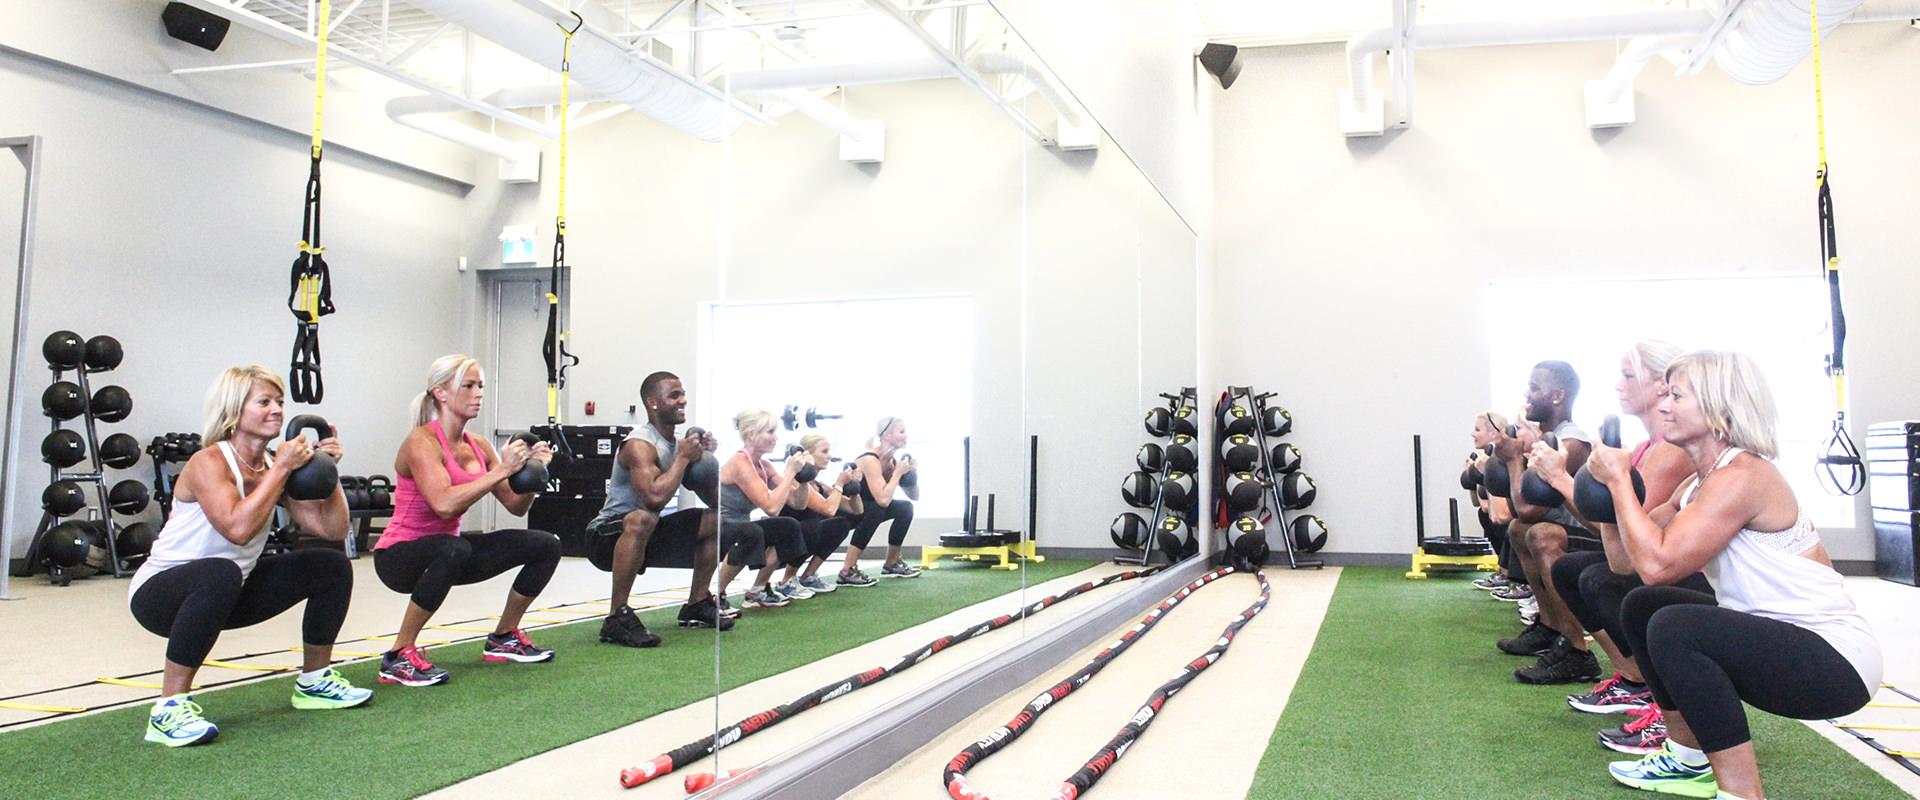 movati010_new_functional_training_room